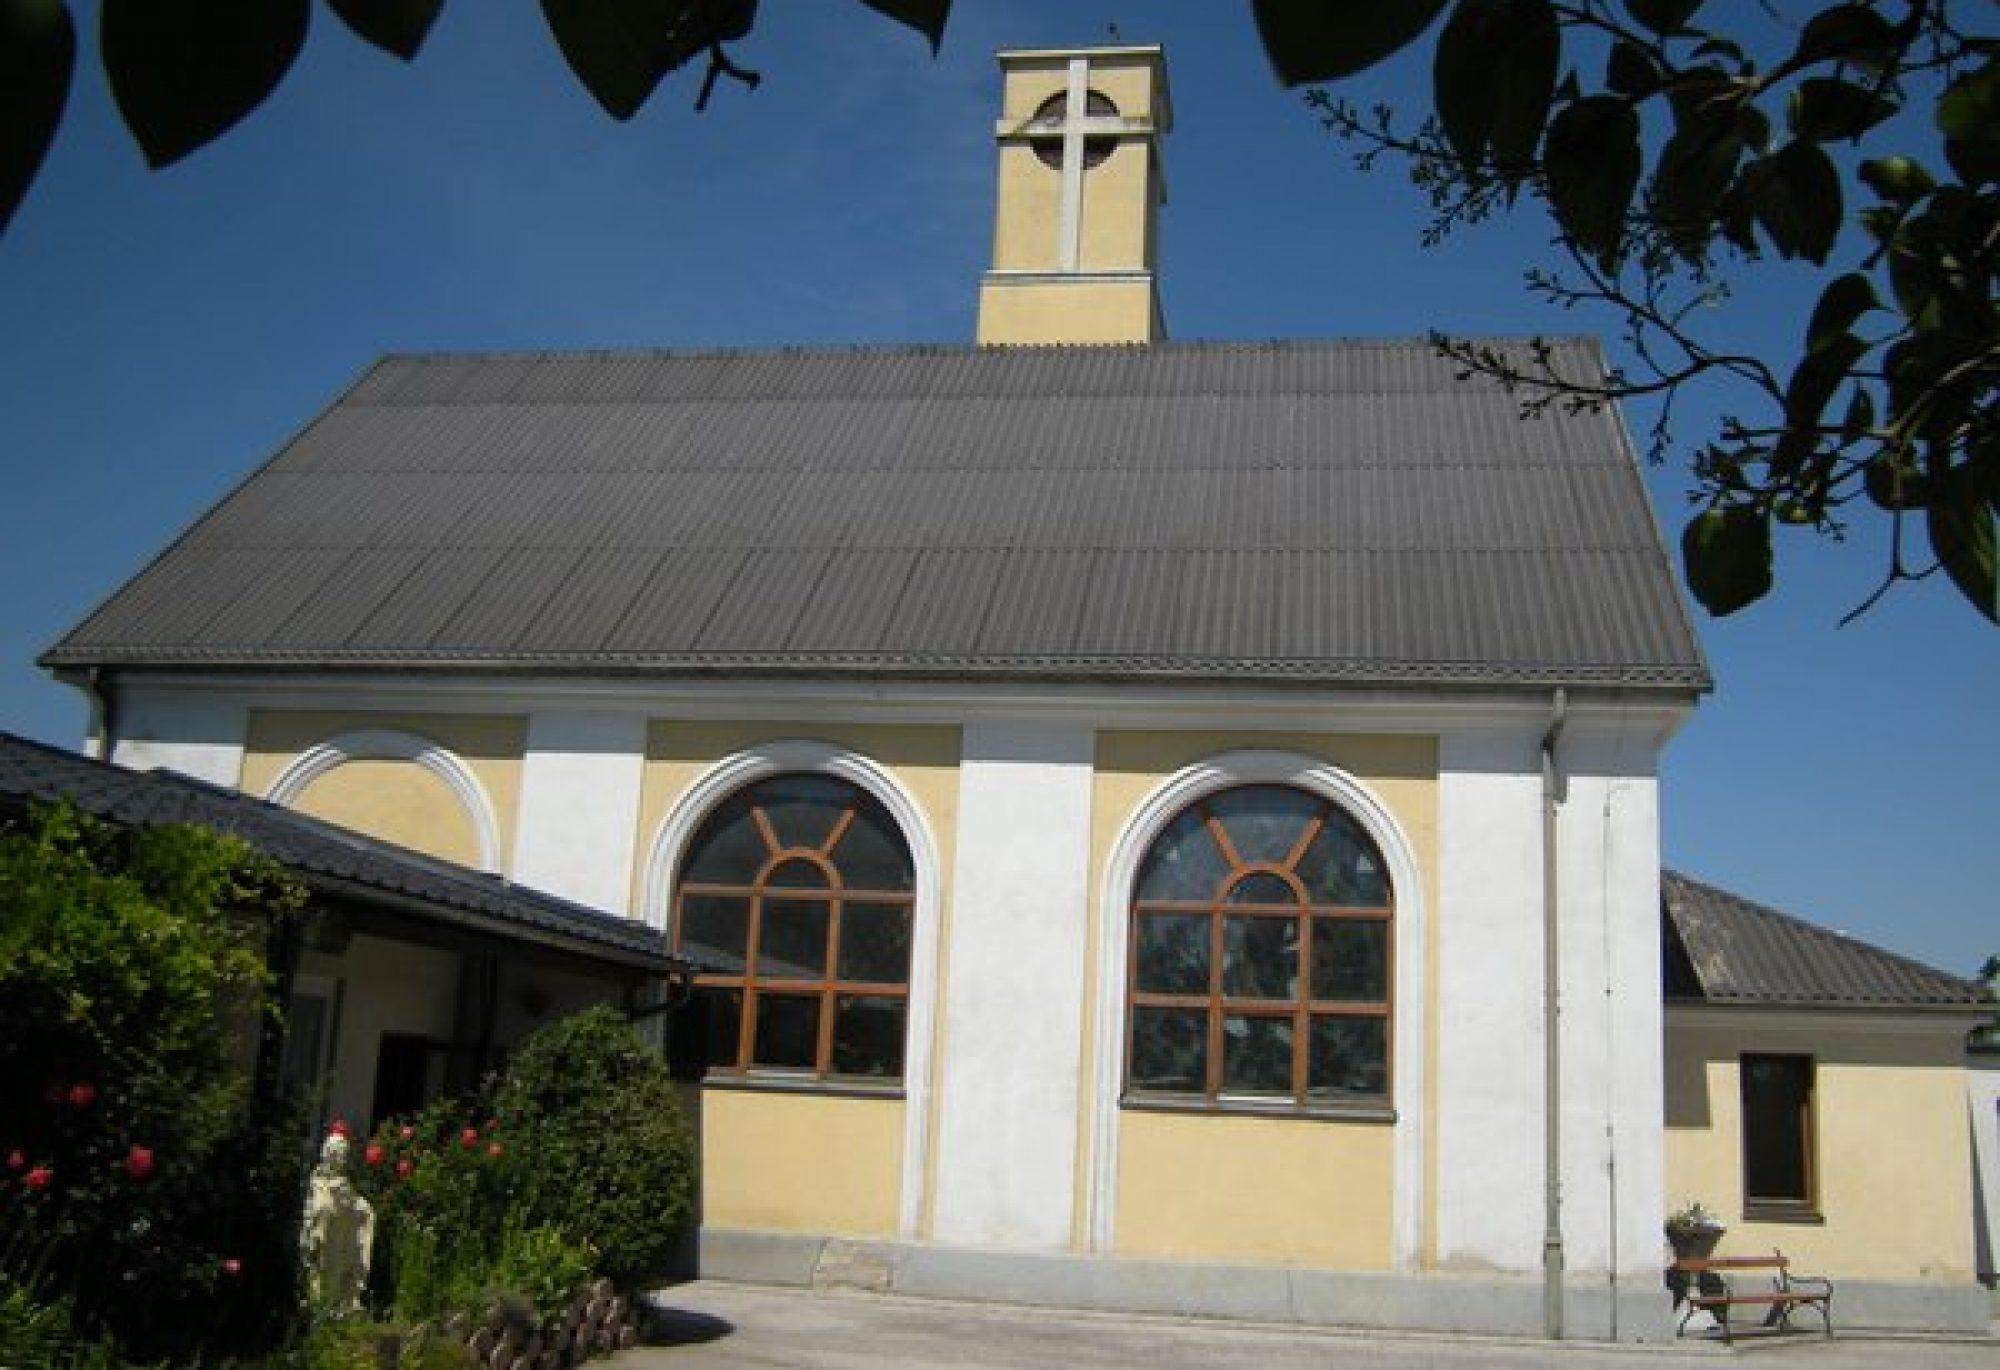 Pfarre St. Anton am Flugfeld